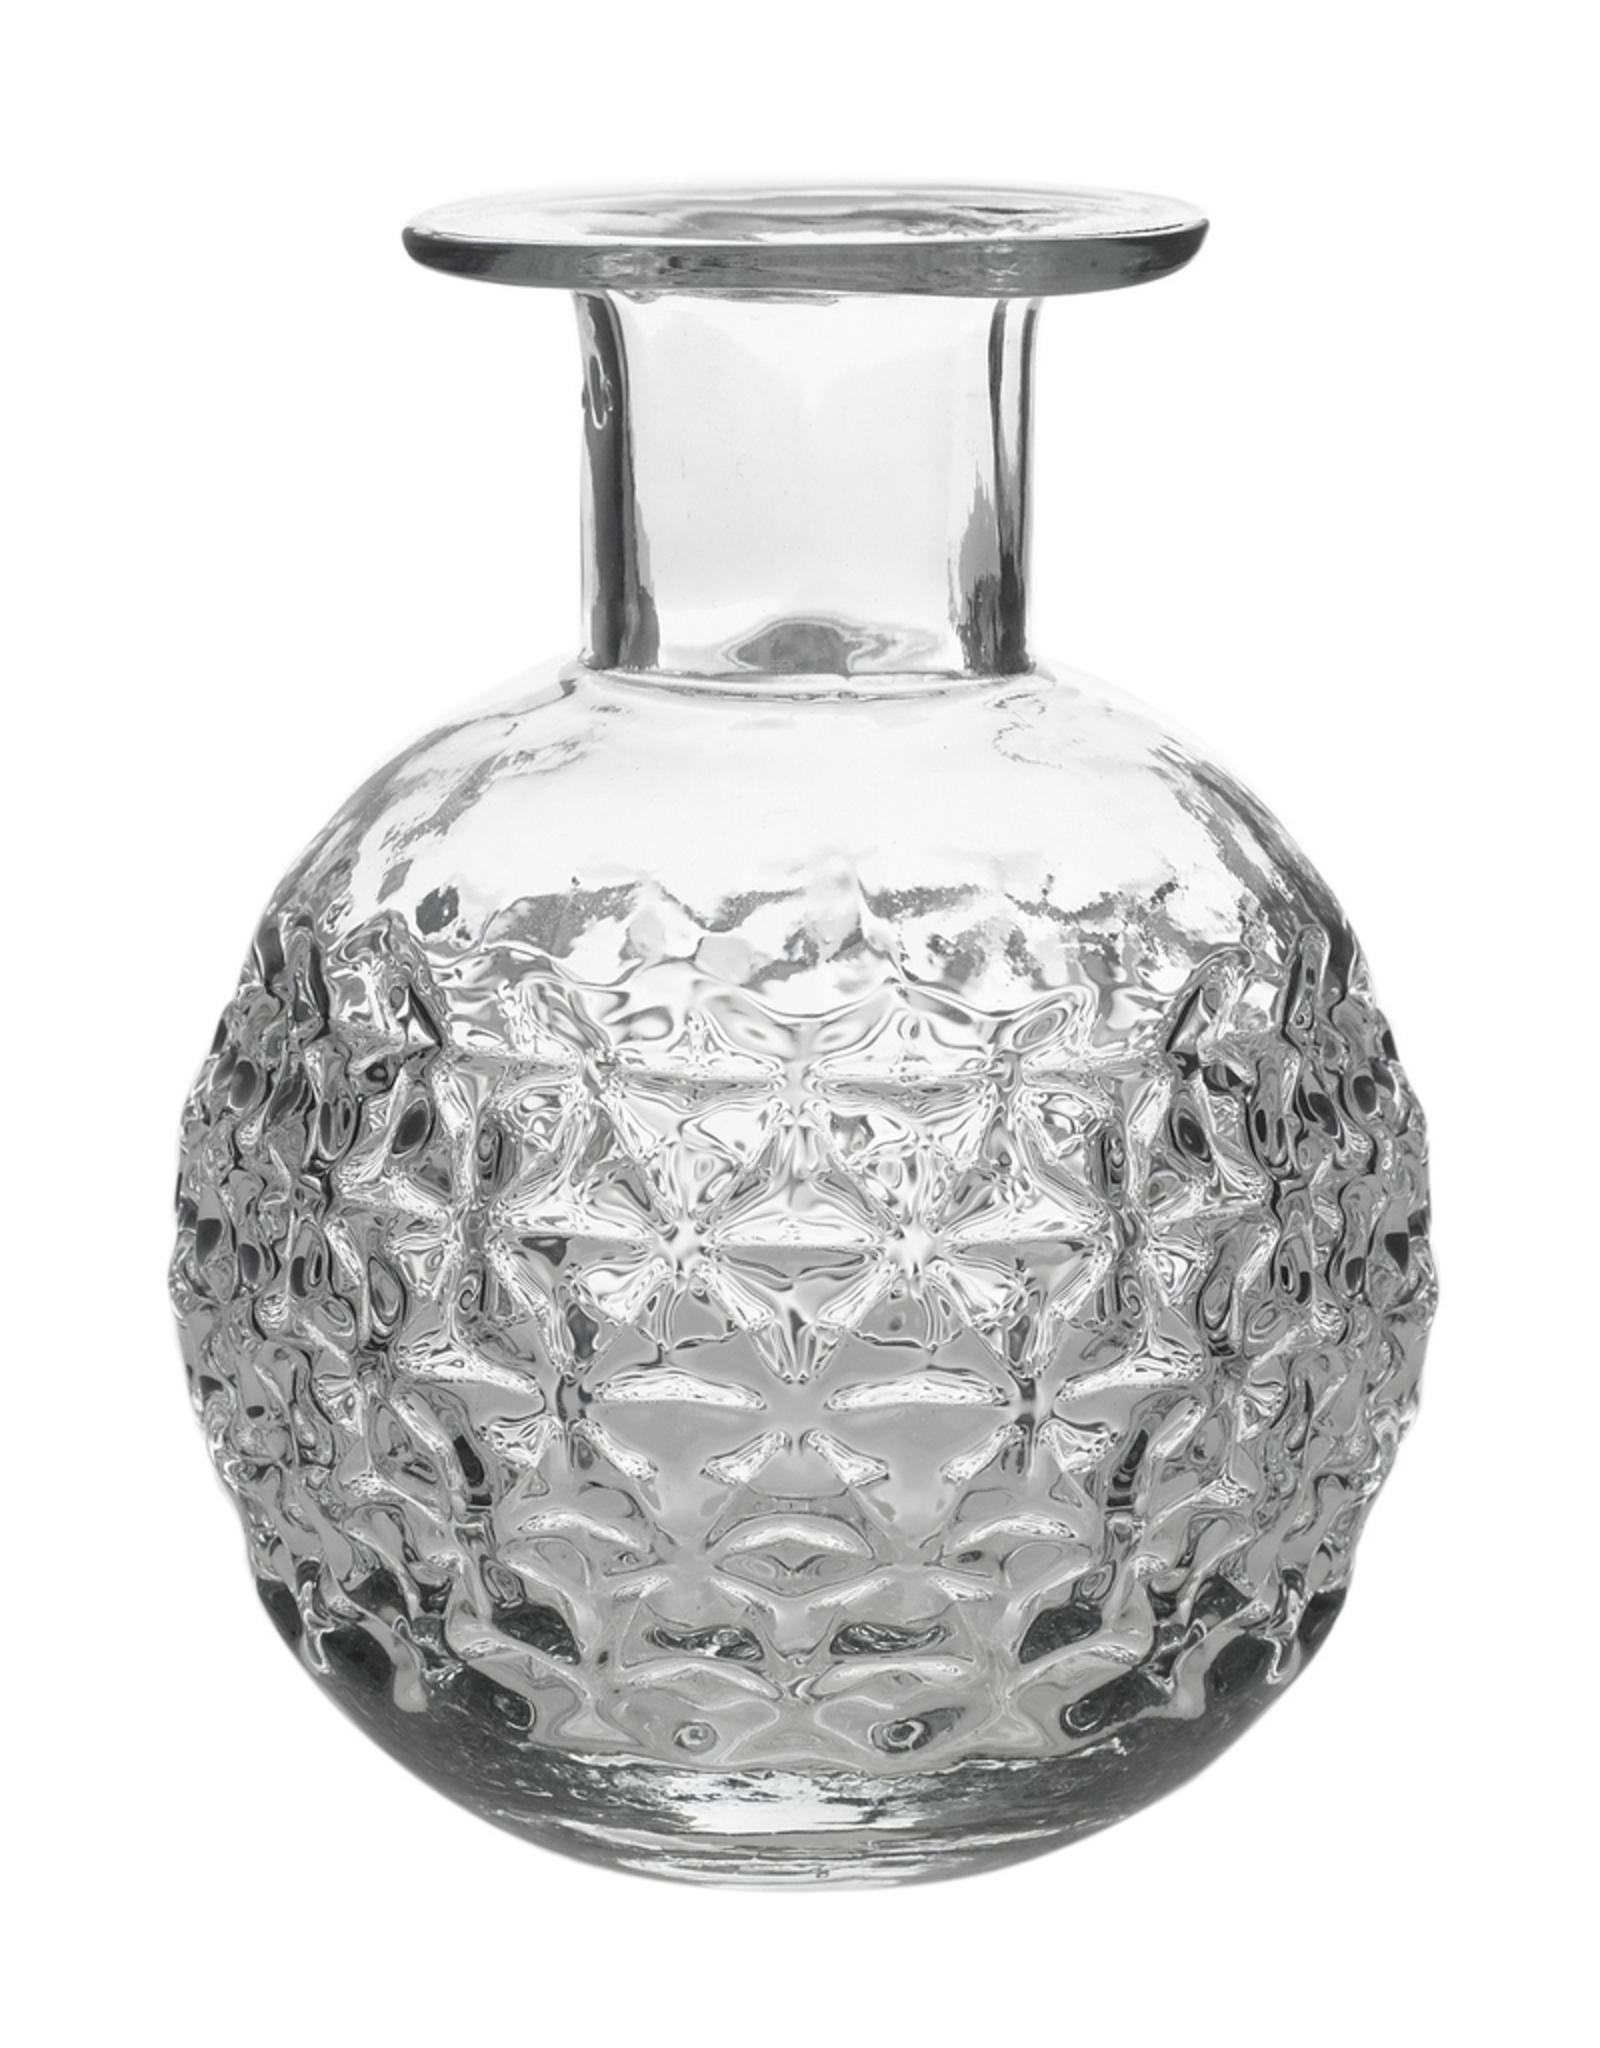 Bottle, Elan, Etched Glass, Round